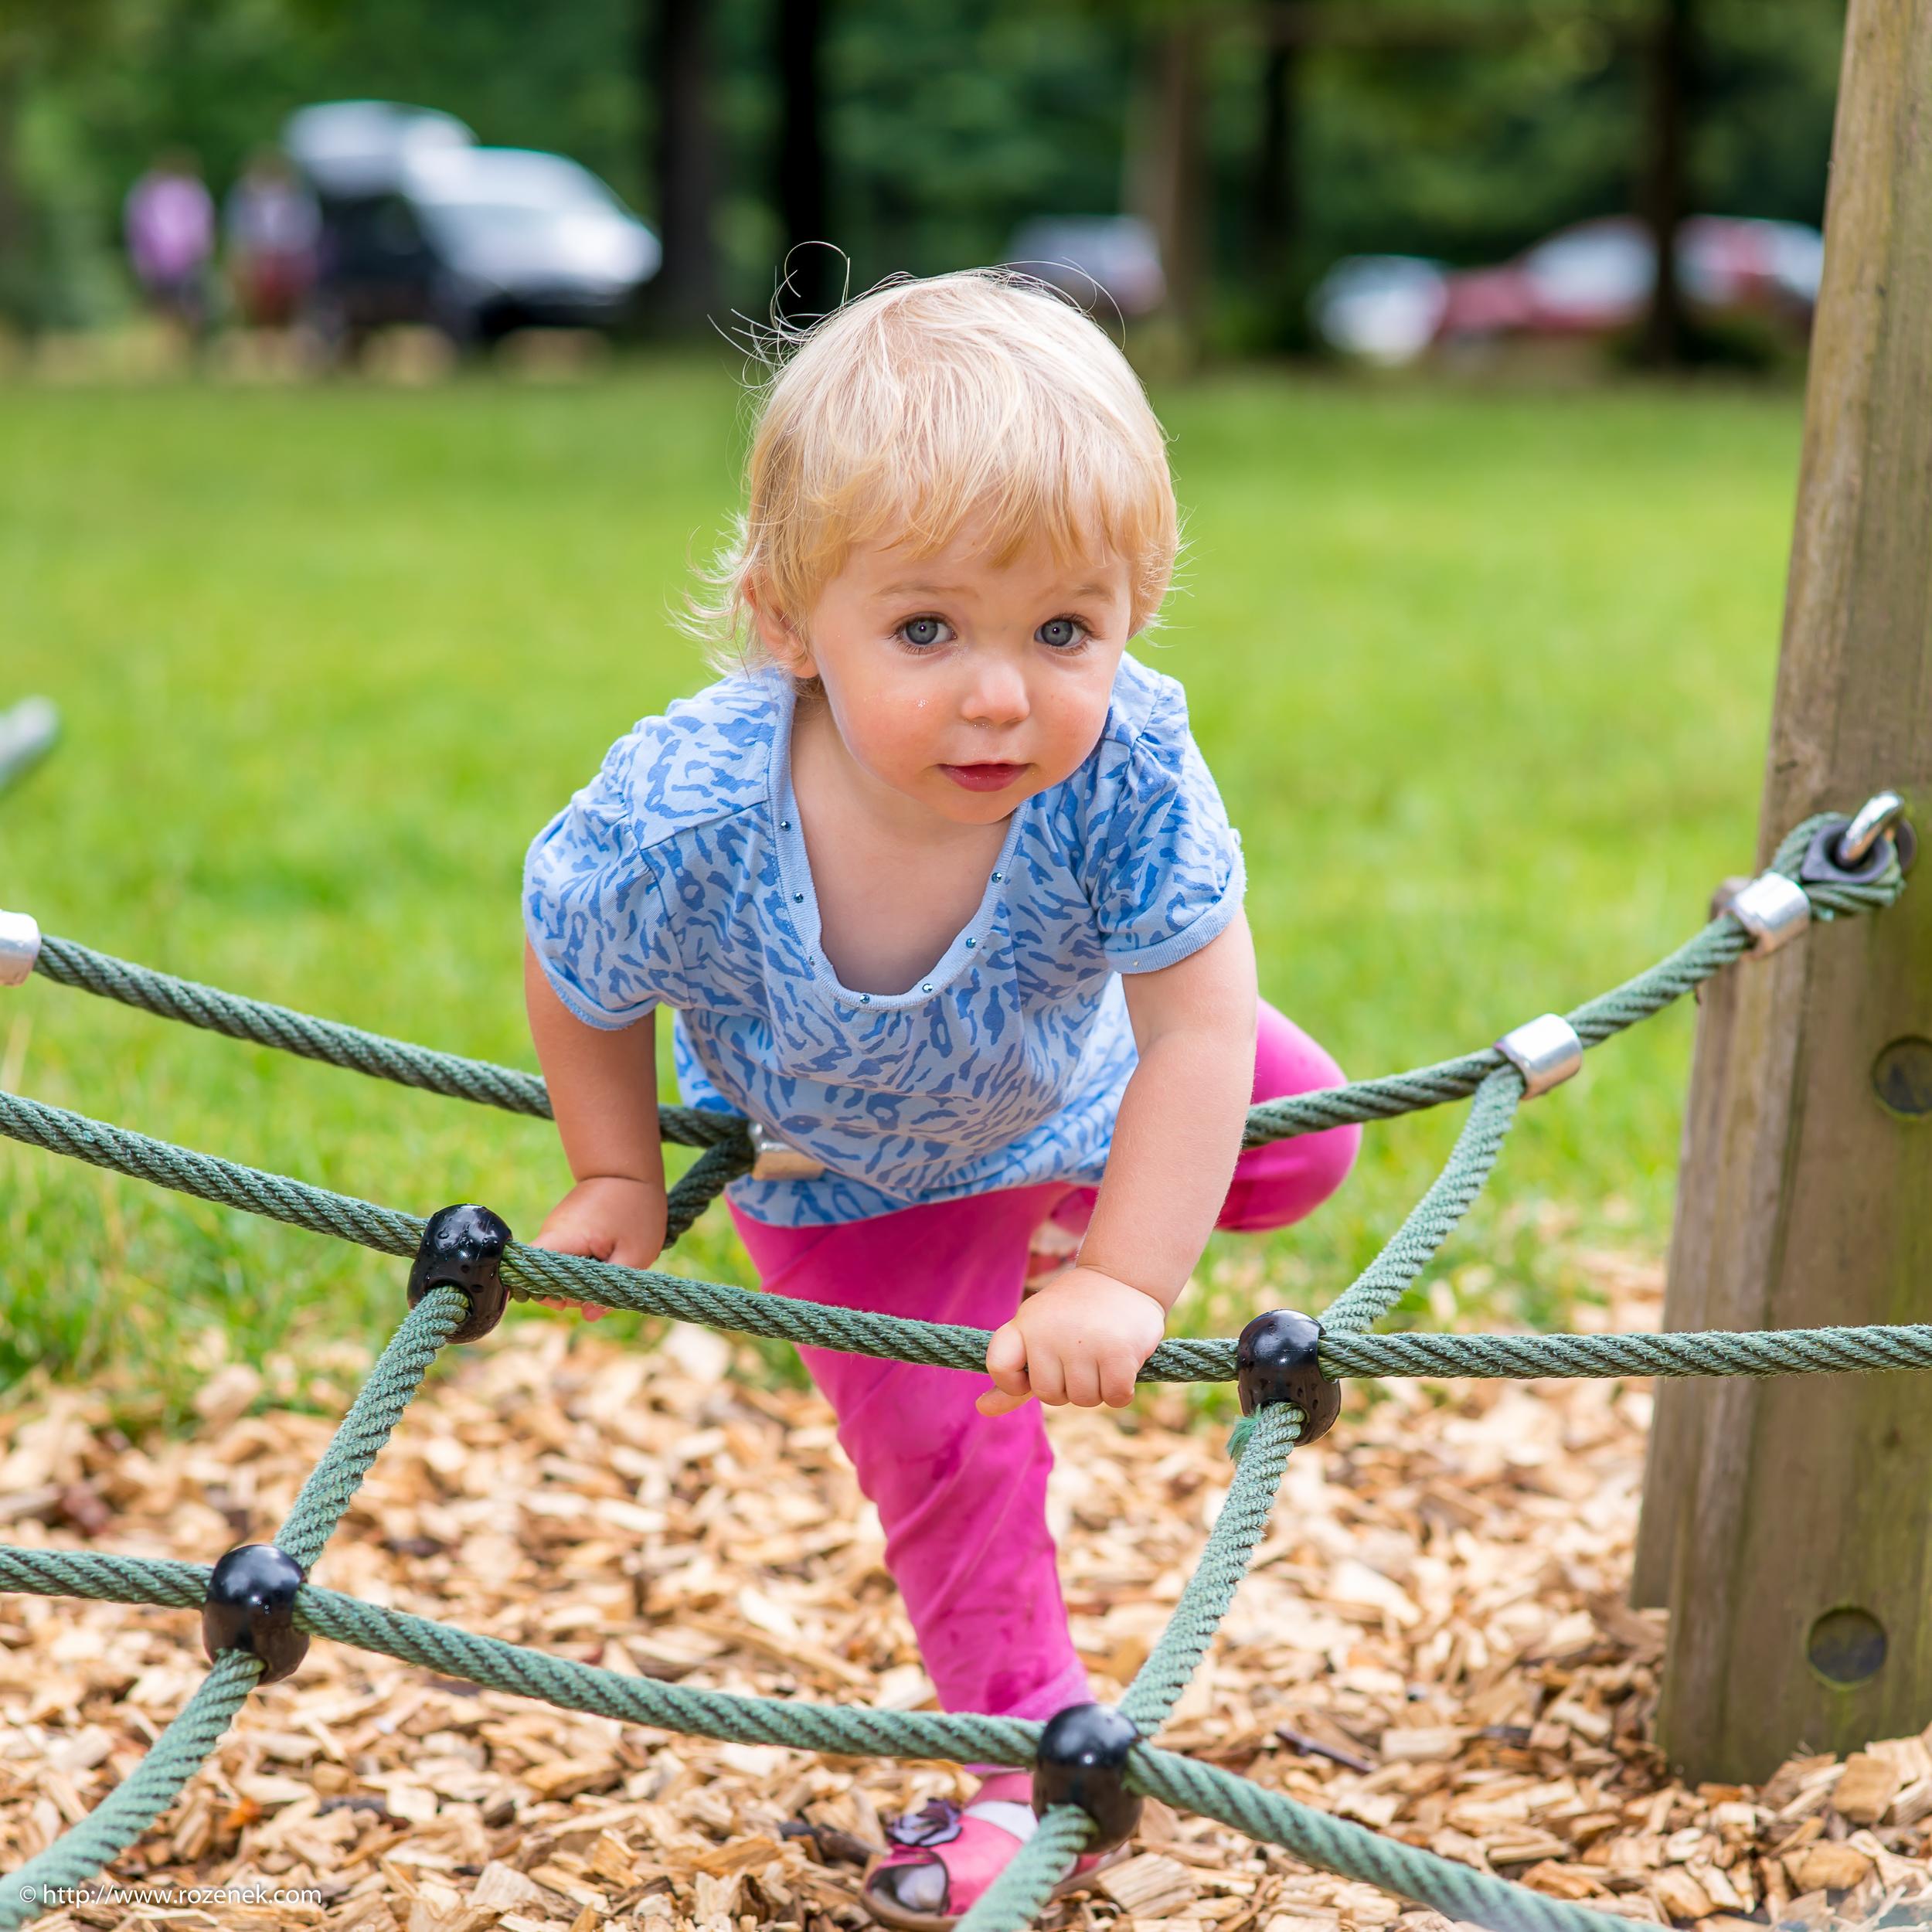 2016.08.05 - Karina at Queen Elizabeth Country Park - 11